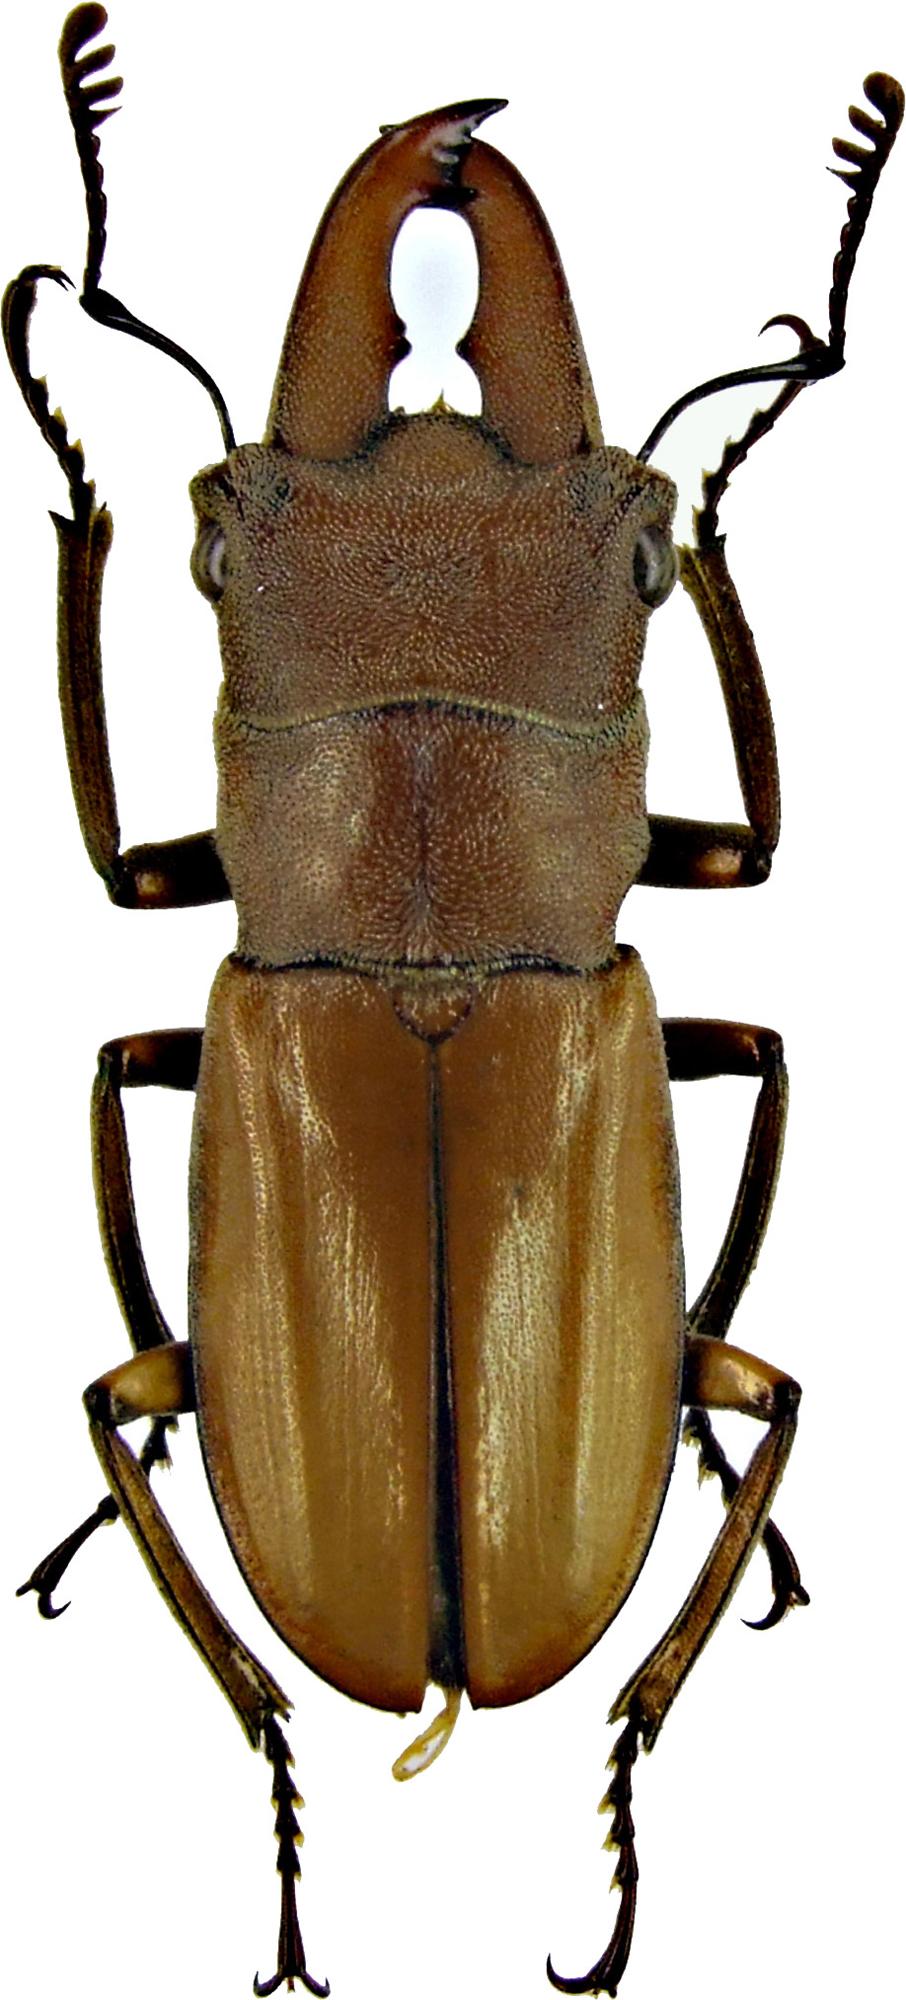 Cyclommatus lunifer 1225.jpg